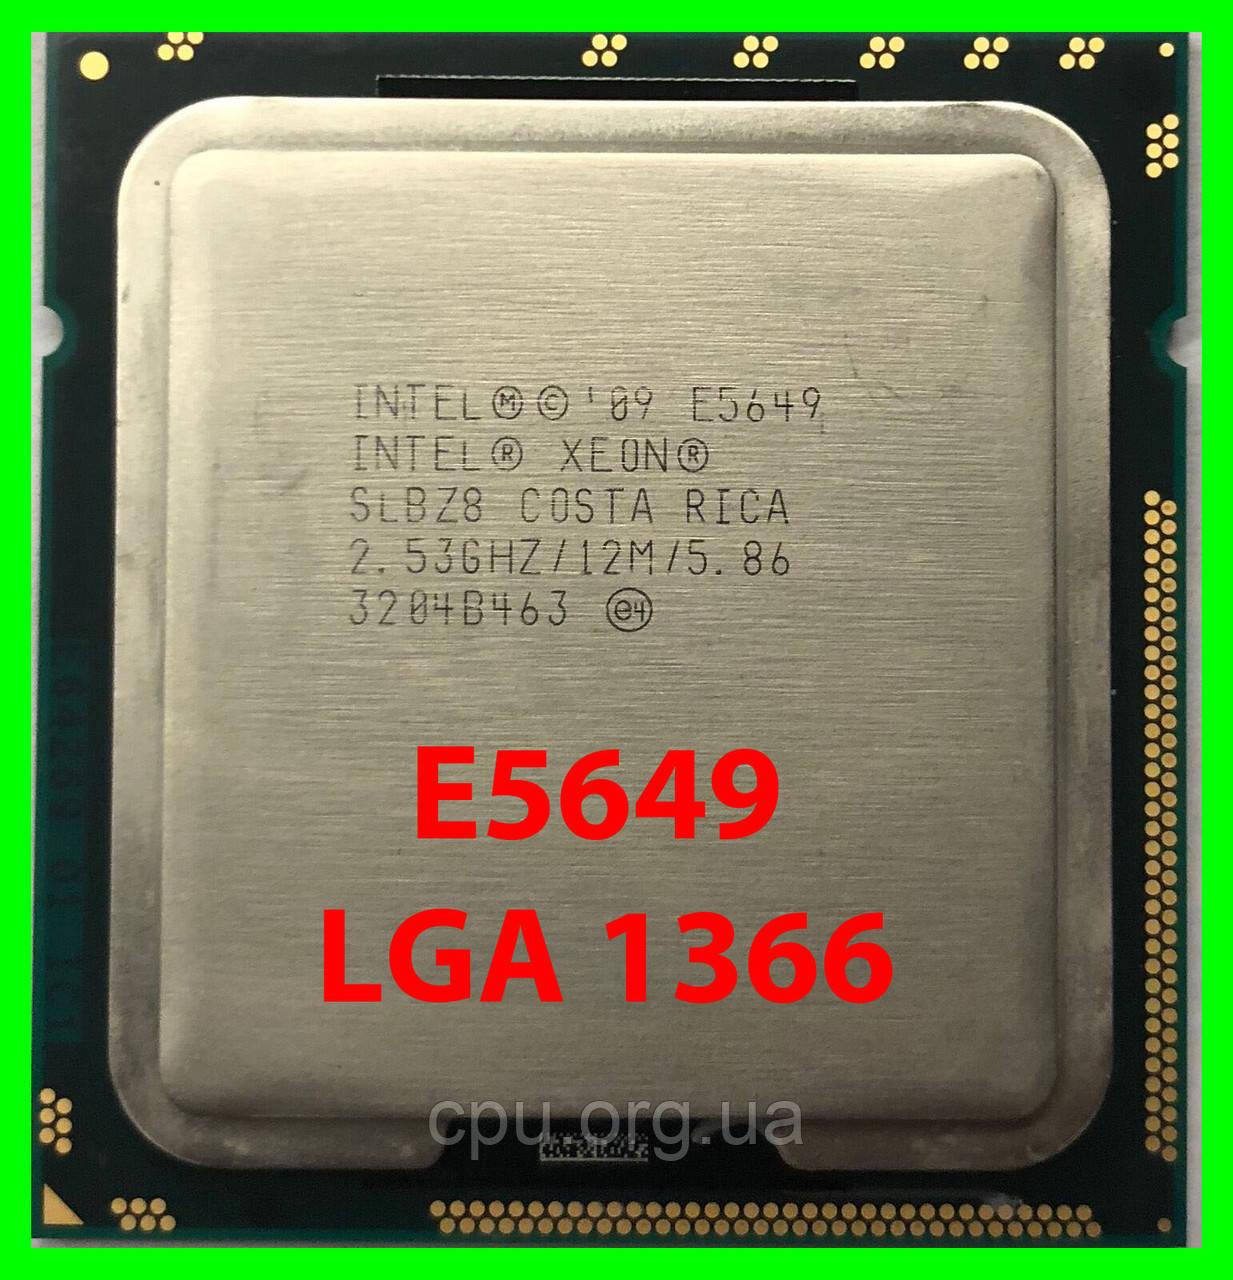 Процесор Intel Xeon E5649 (SLBZ8) 6/12 2,53-2,93 Ghz / 12M / 5.86 GT/s, LGA 1366